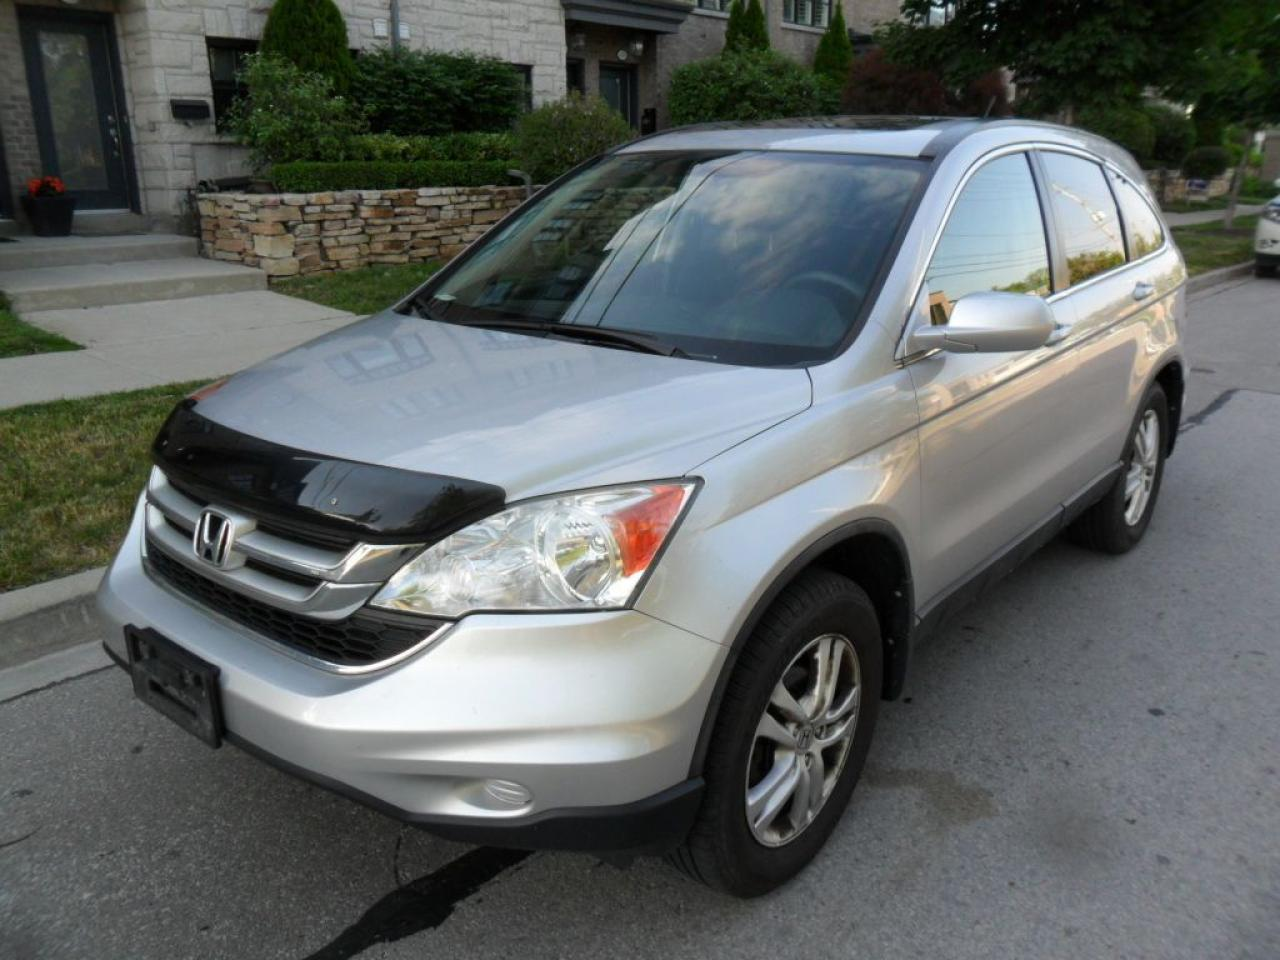 Photo of Silver 2010 Honda CR-V